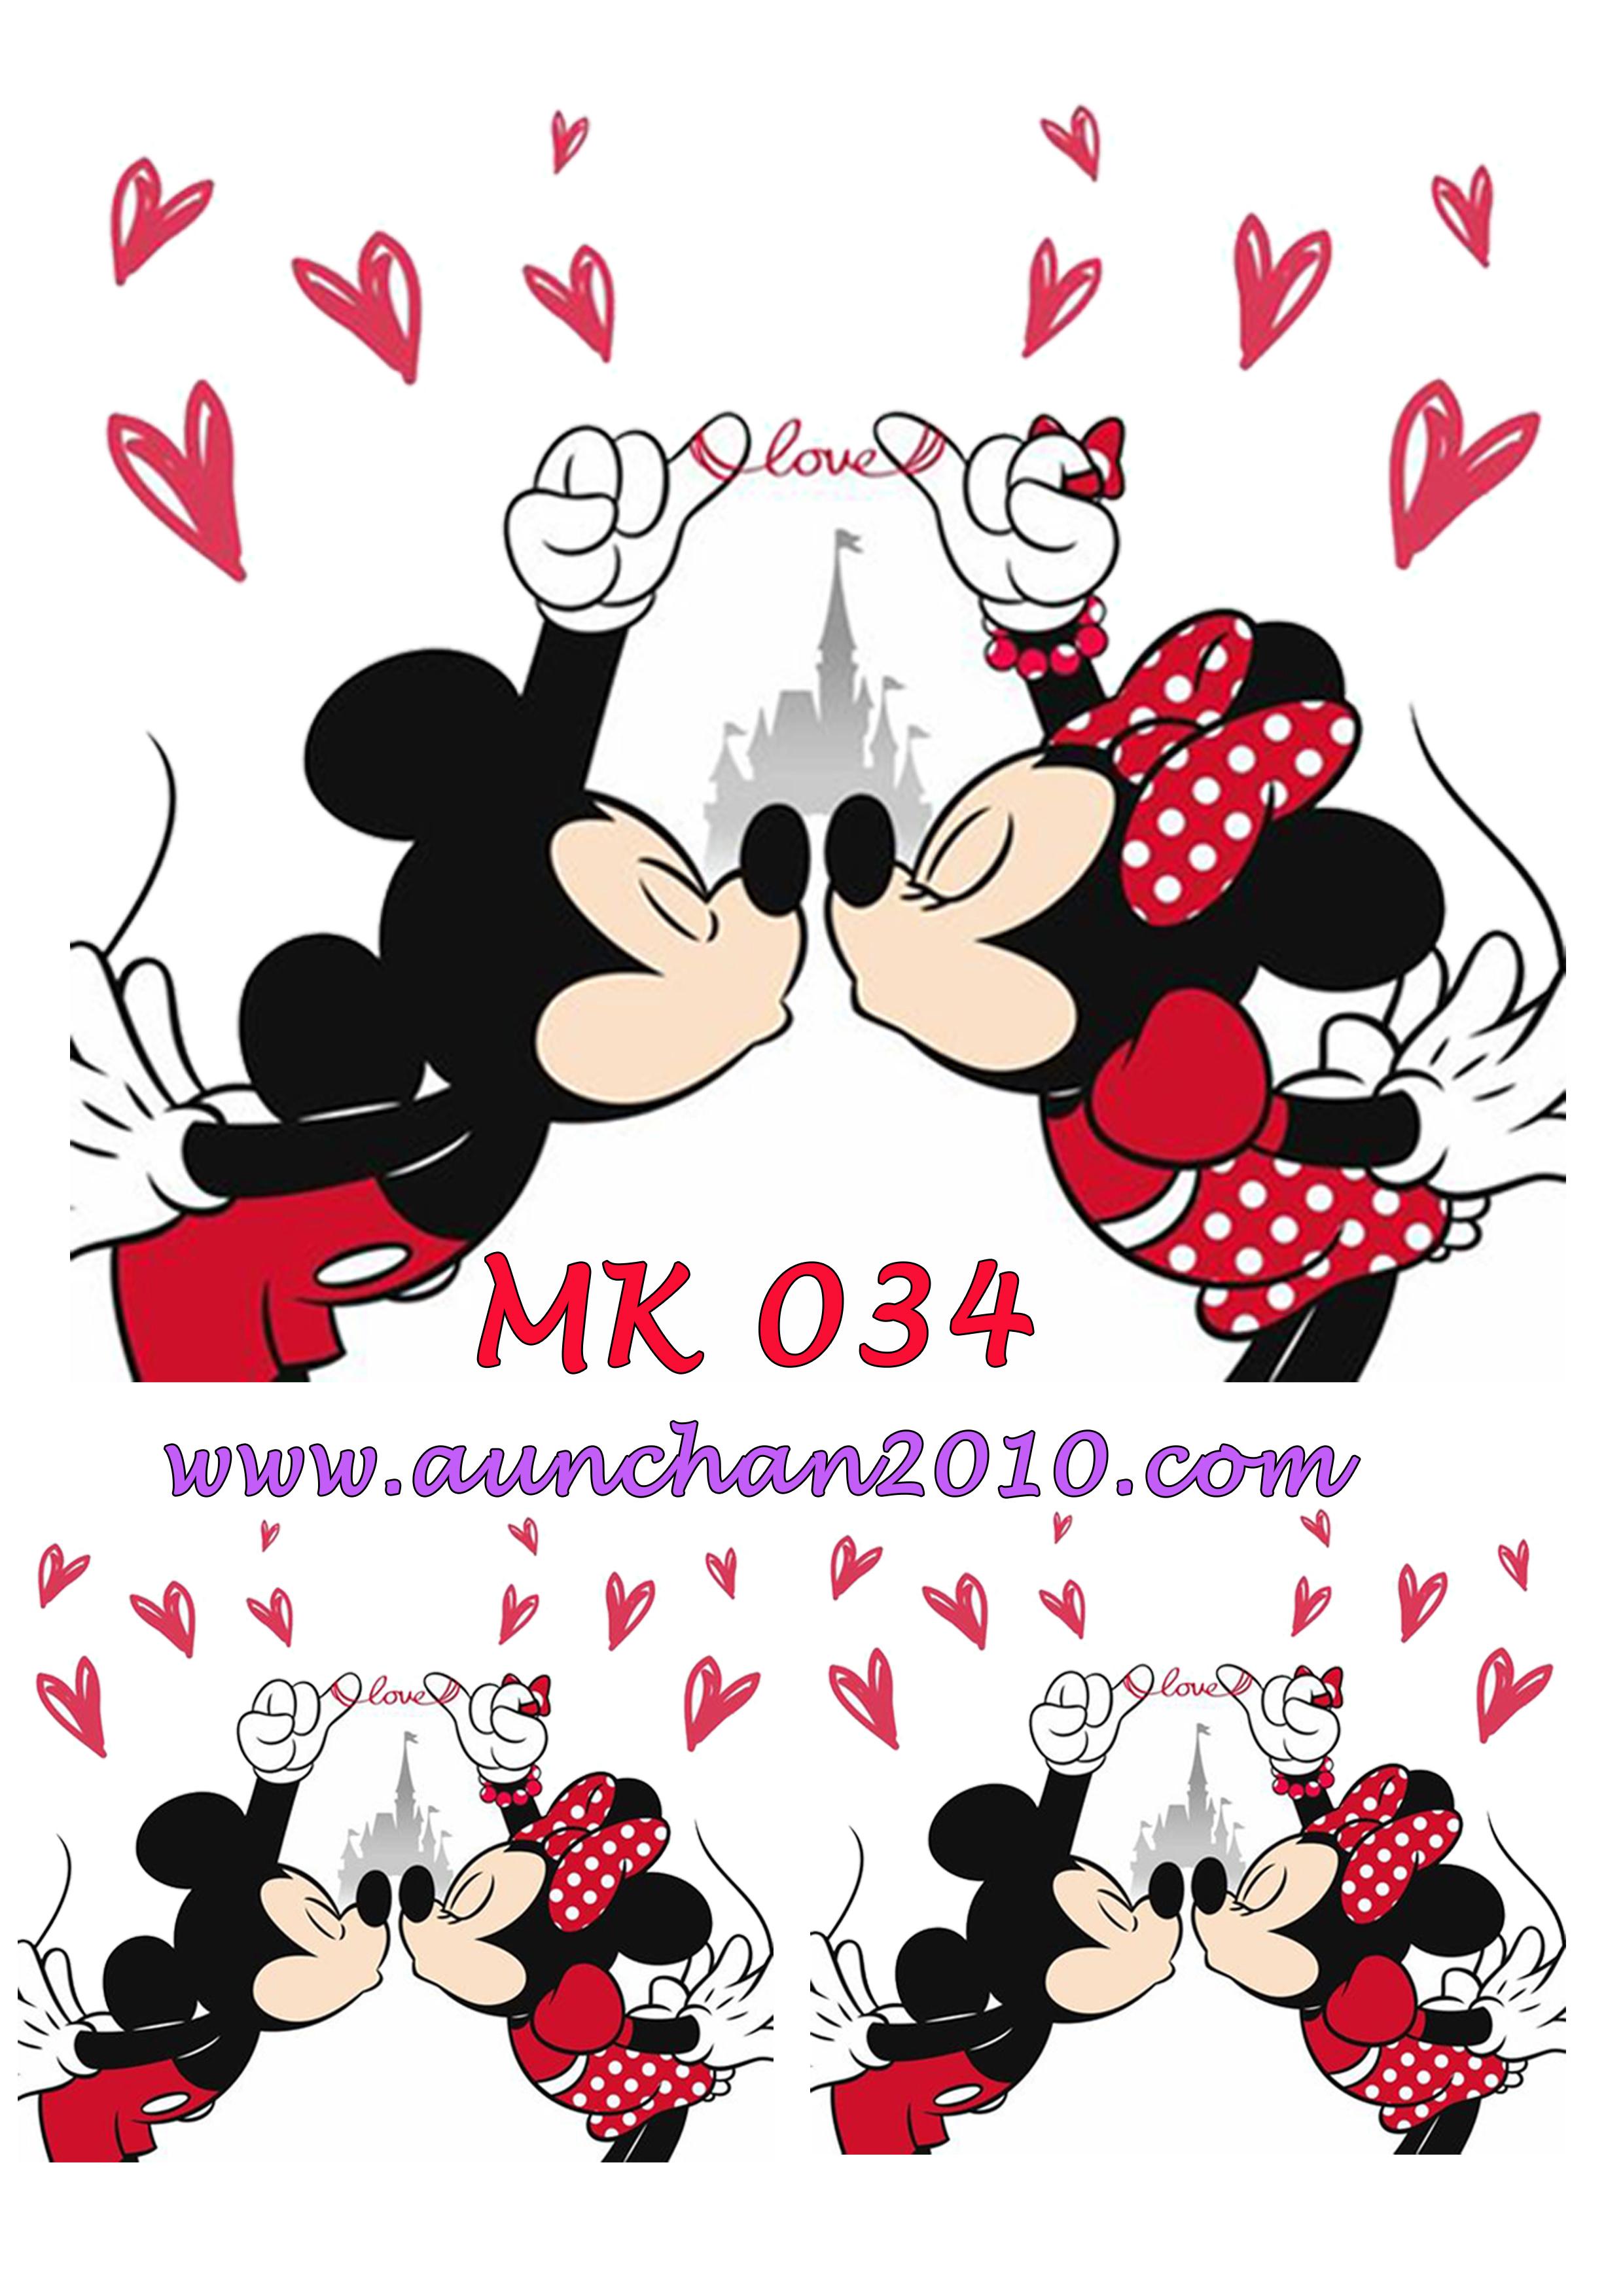 MK034 กระดาษแนพกิ้น 21x30ซม. ลายมิคกี้เม้าส์